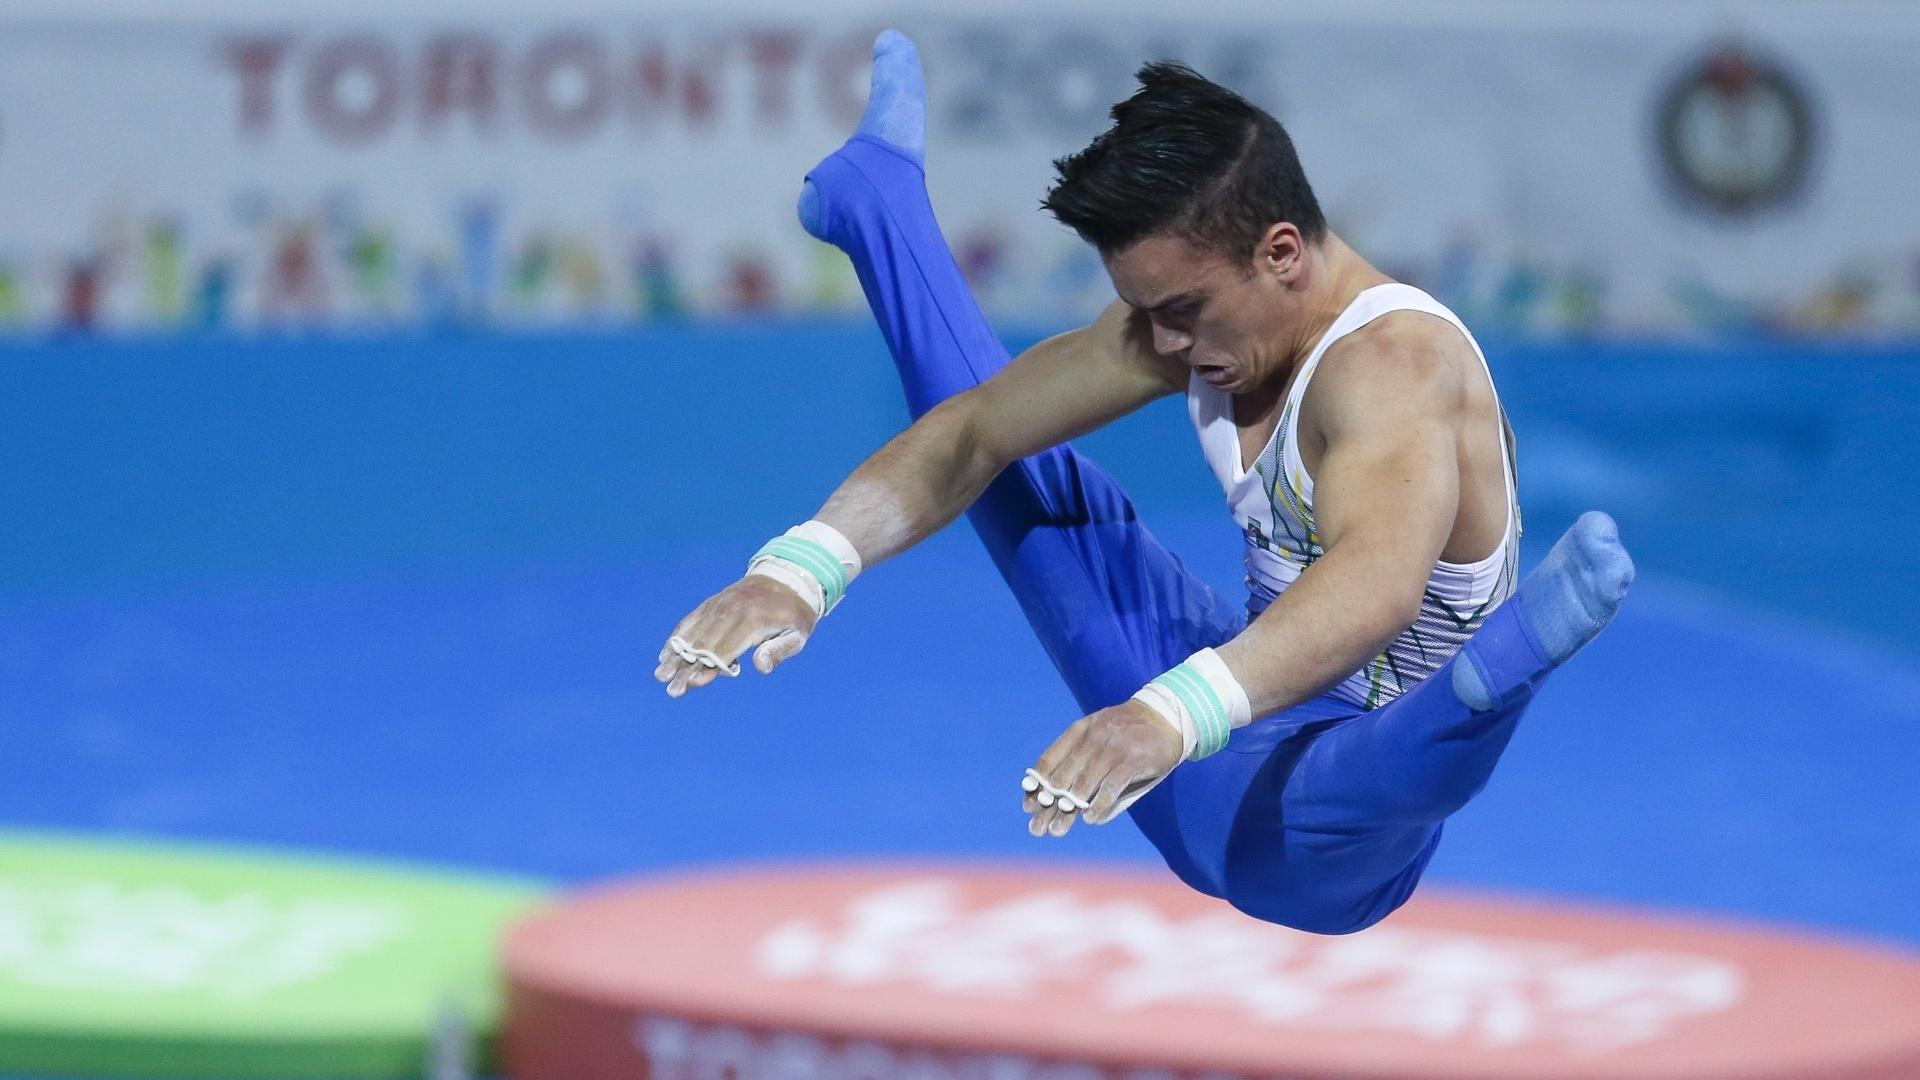 Caio Souza chegou a brigar pelo ouro na final do individual geral da ginástica masculina